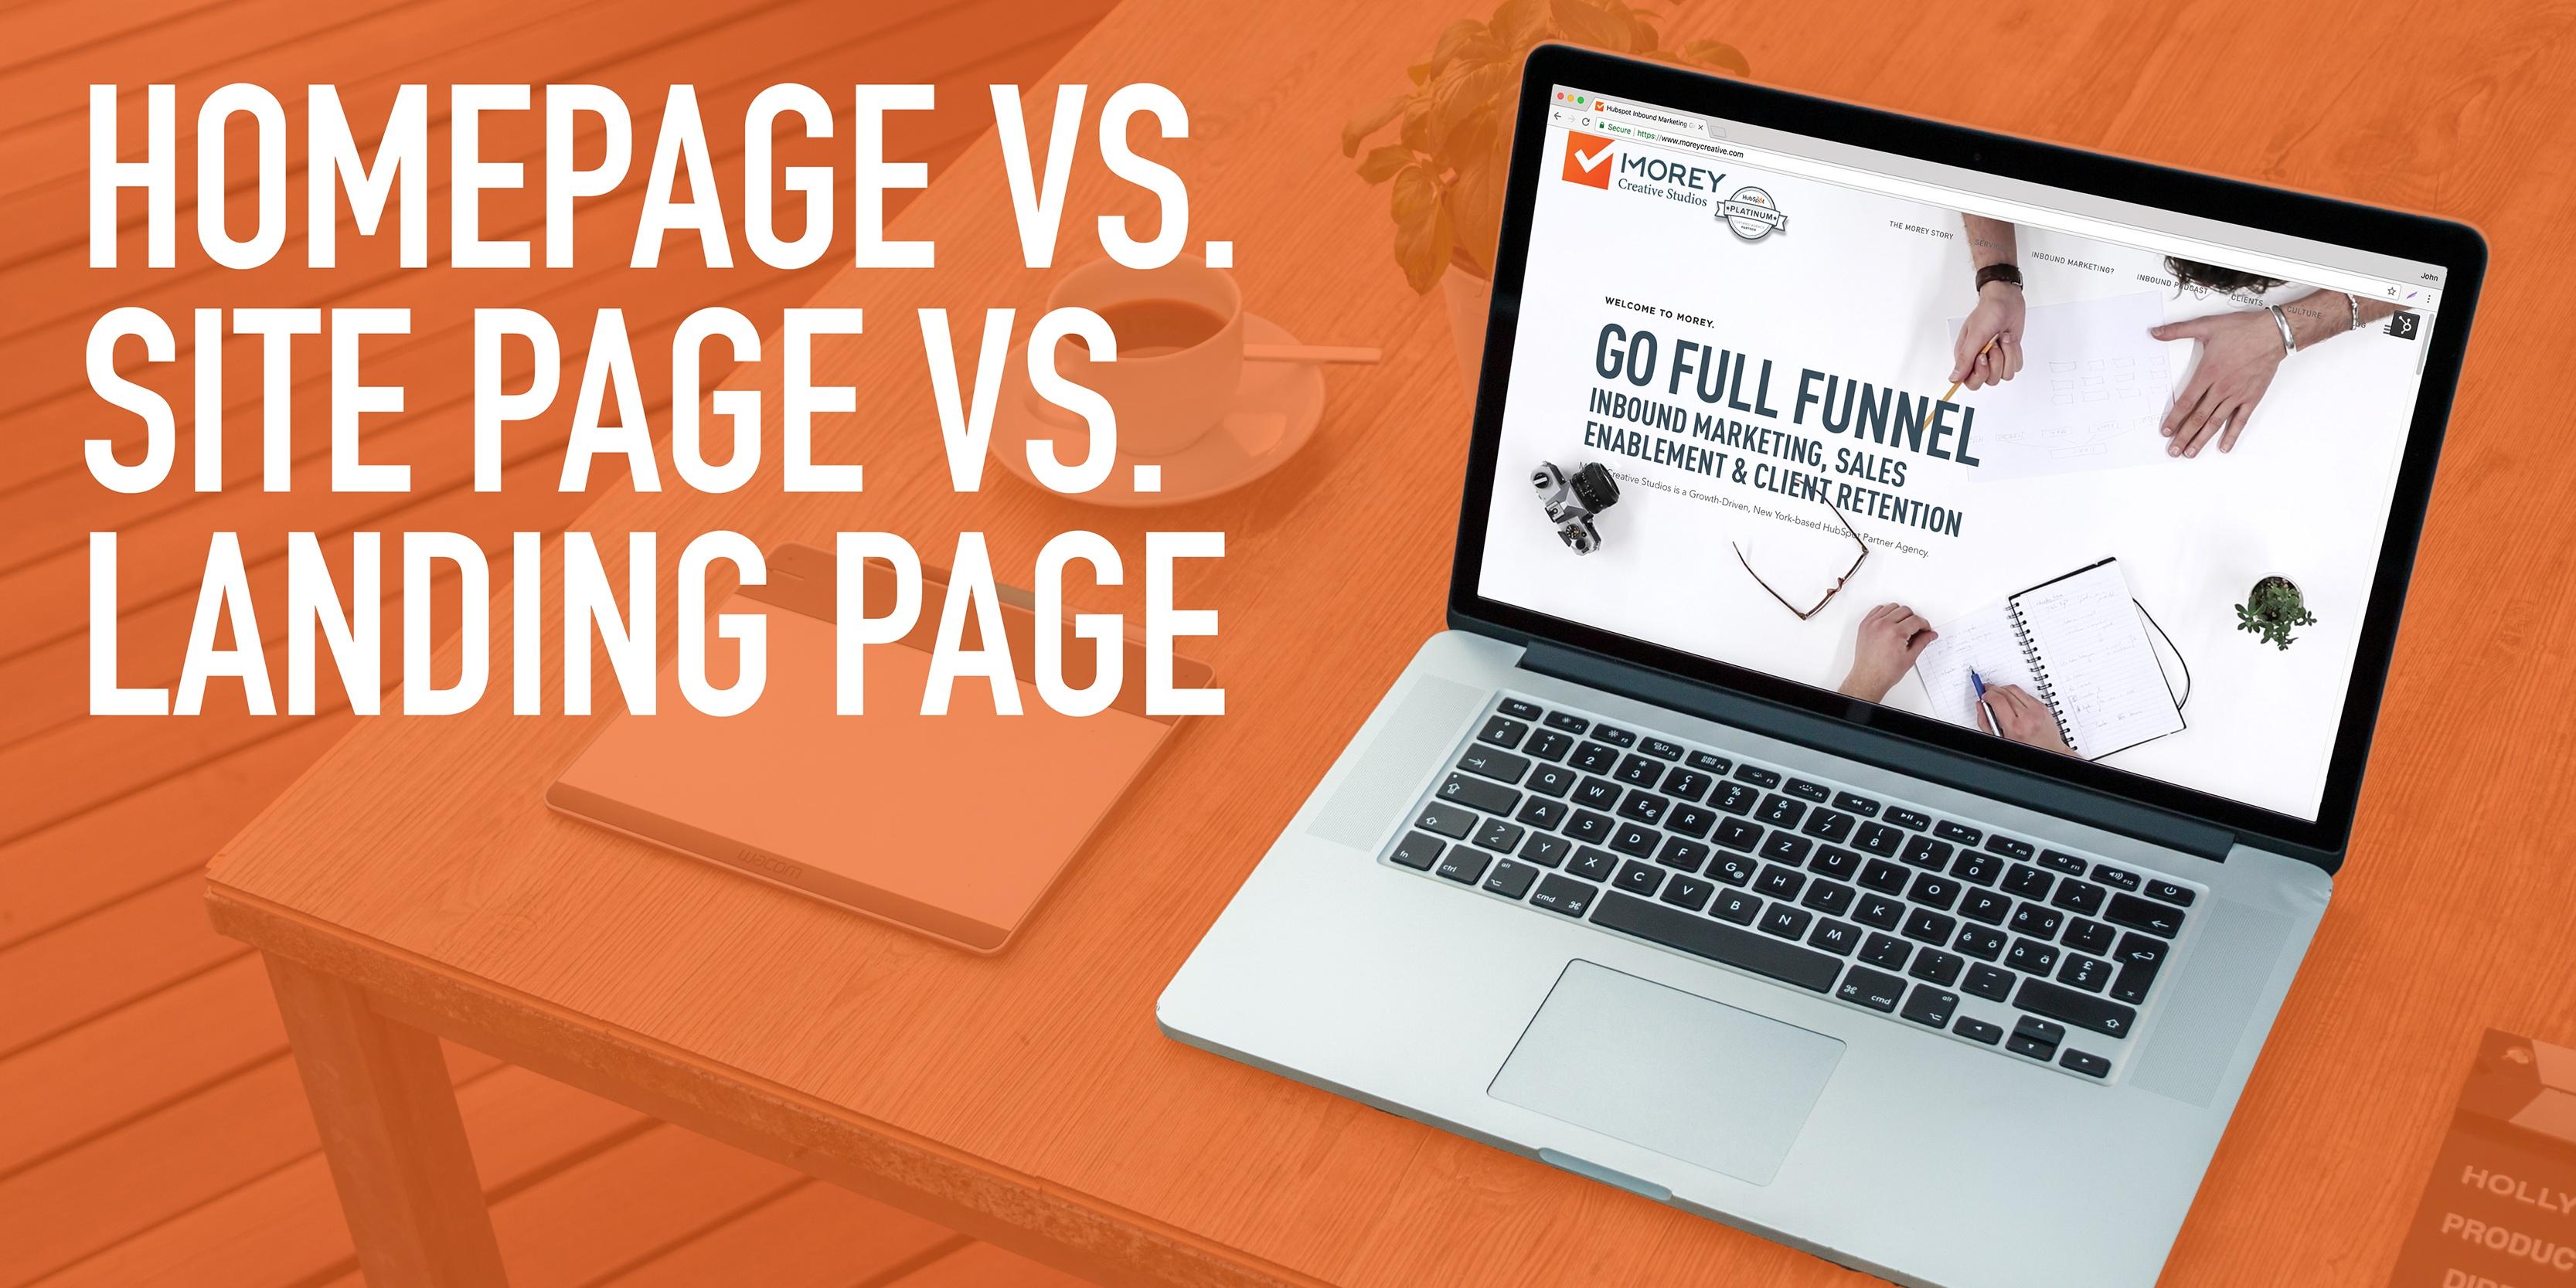 Morey-Blog_Homepage-vs-SitePage-vs-LandingPage.jpg